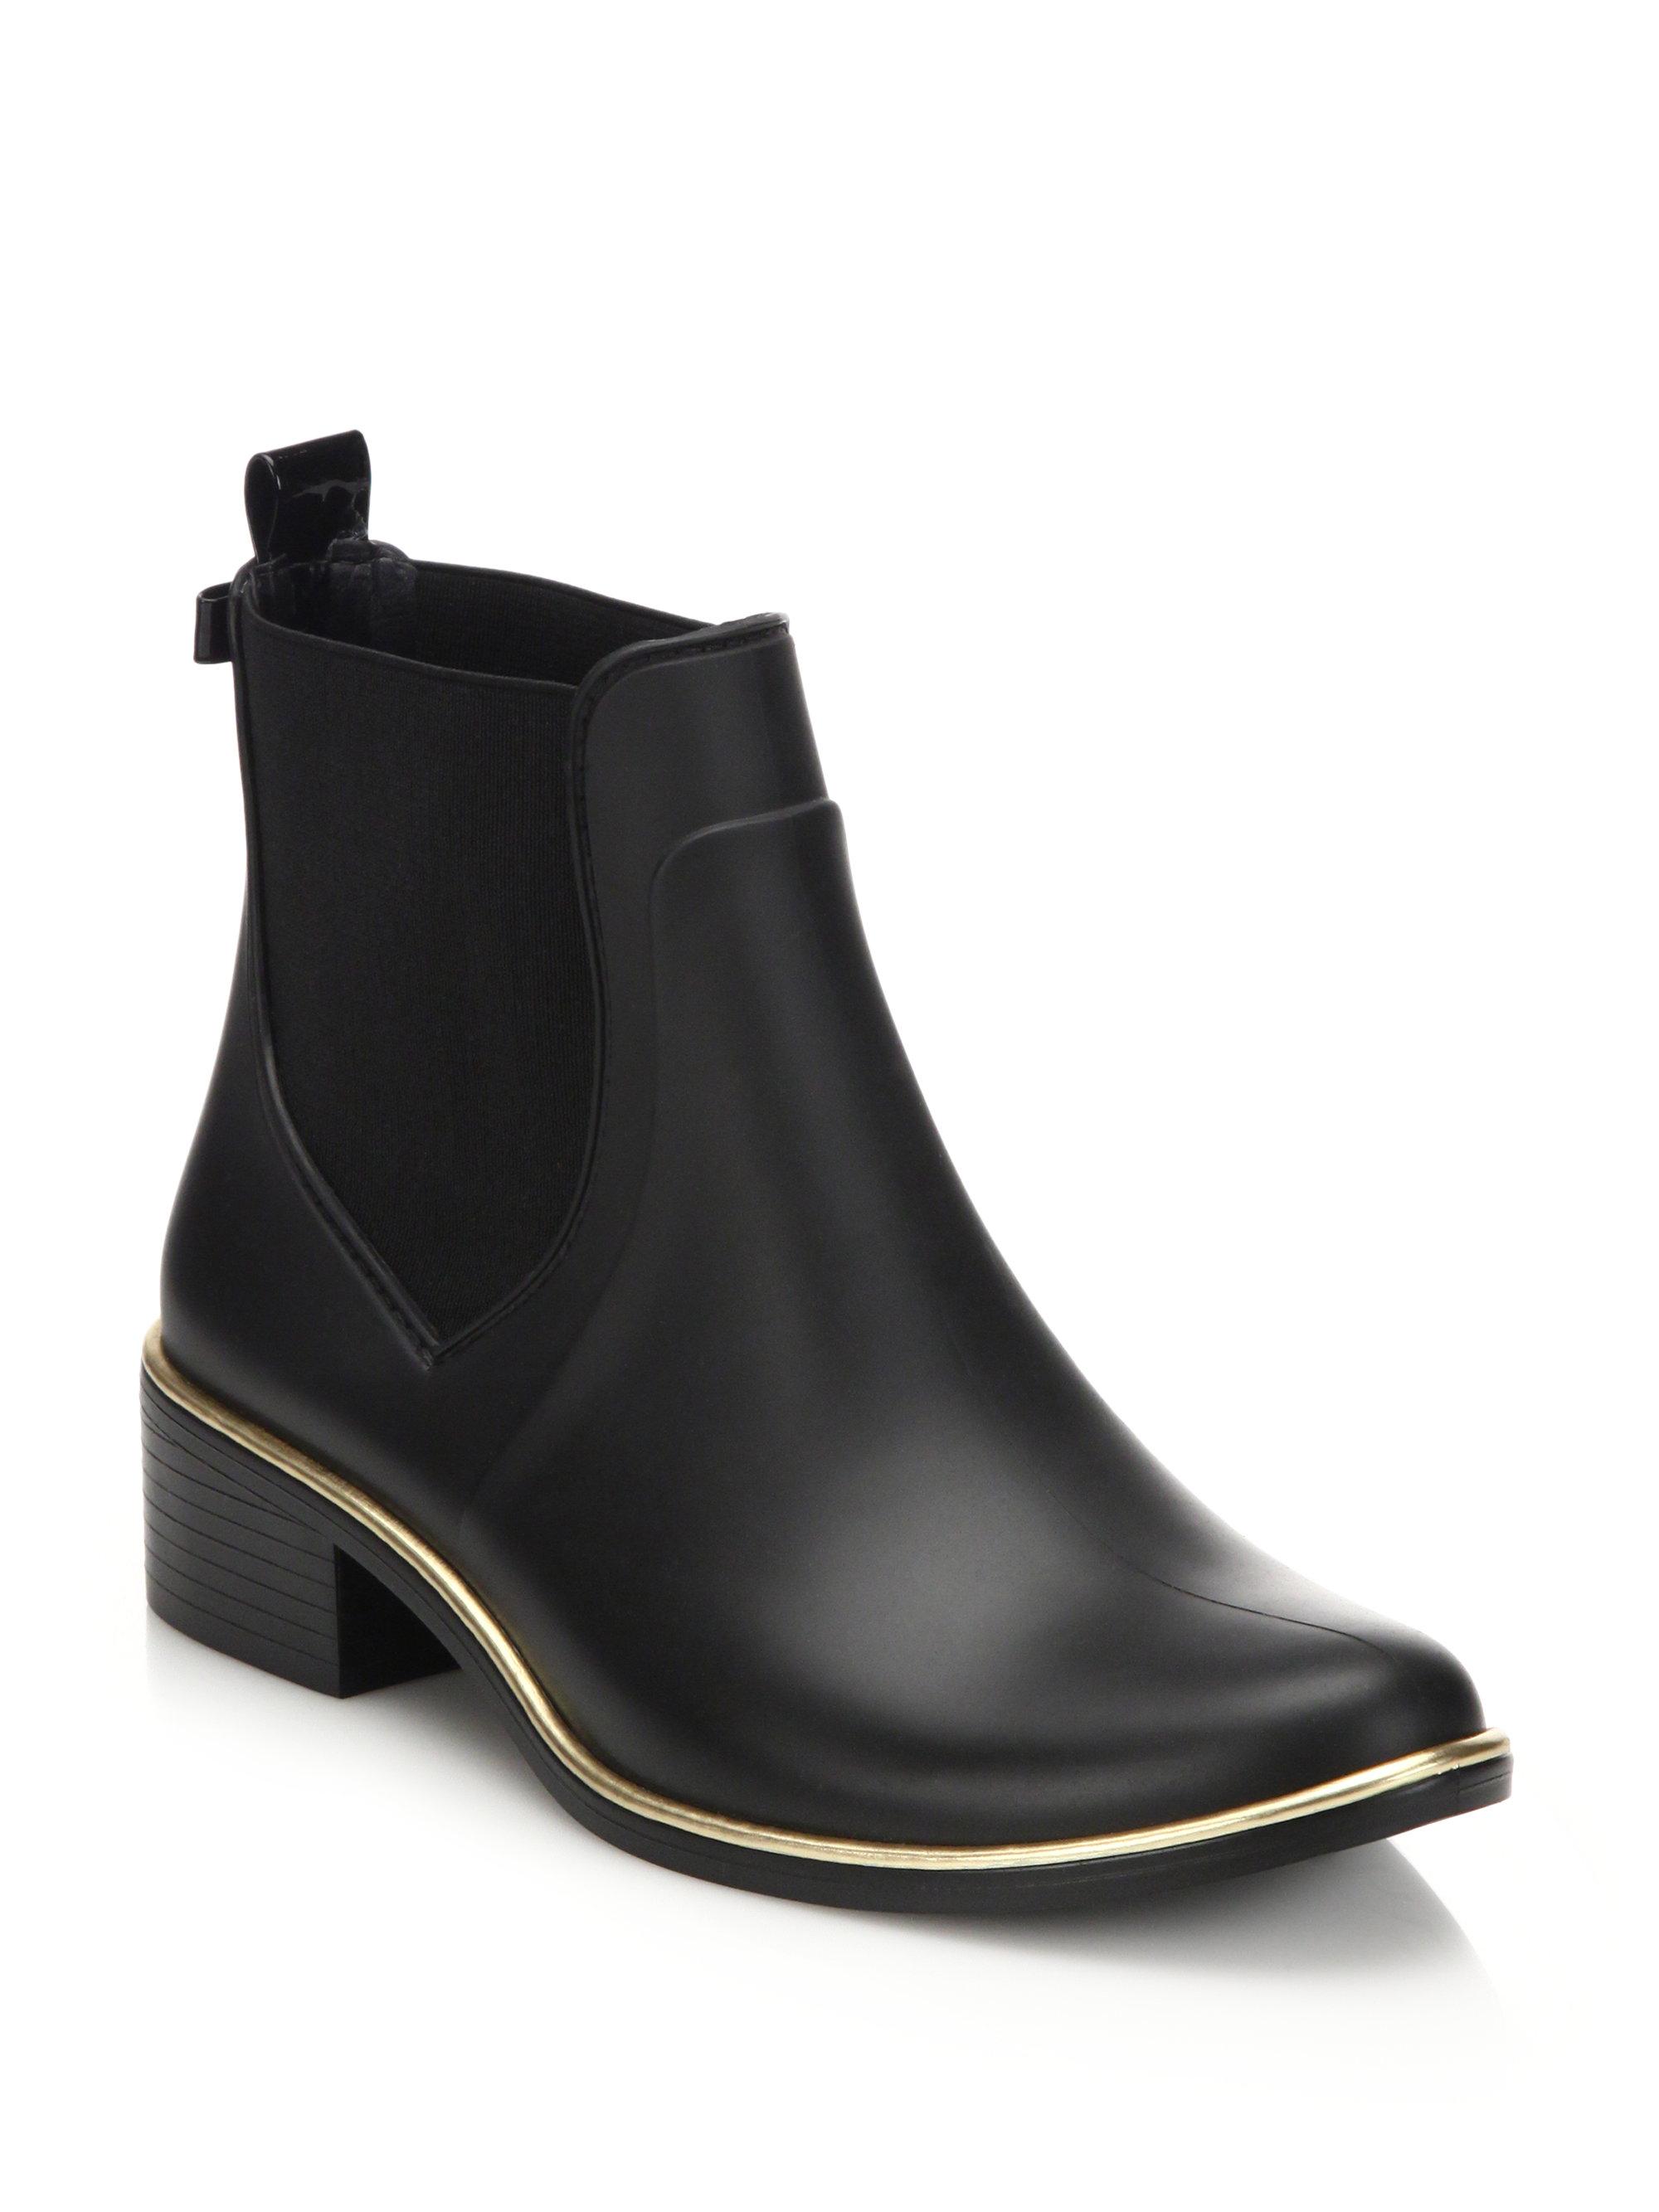 Kate Spade Sedgewick Rubber Chelsea Rainboots In Black - Lyst-6480